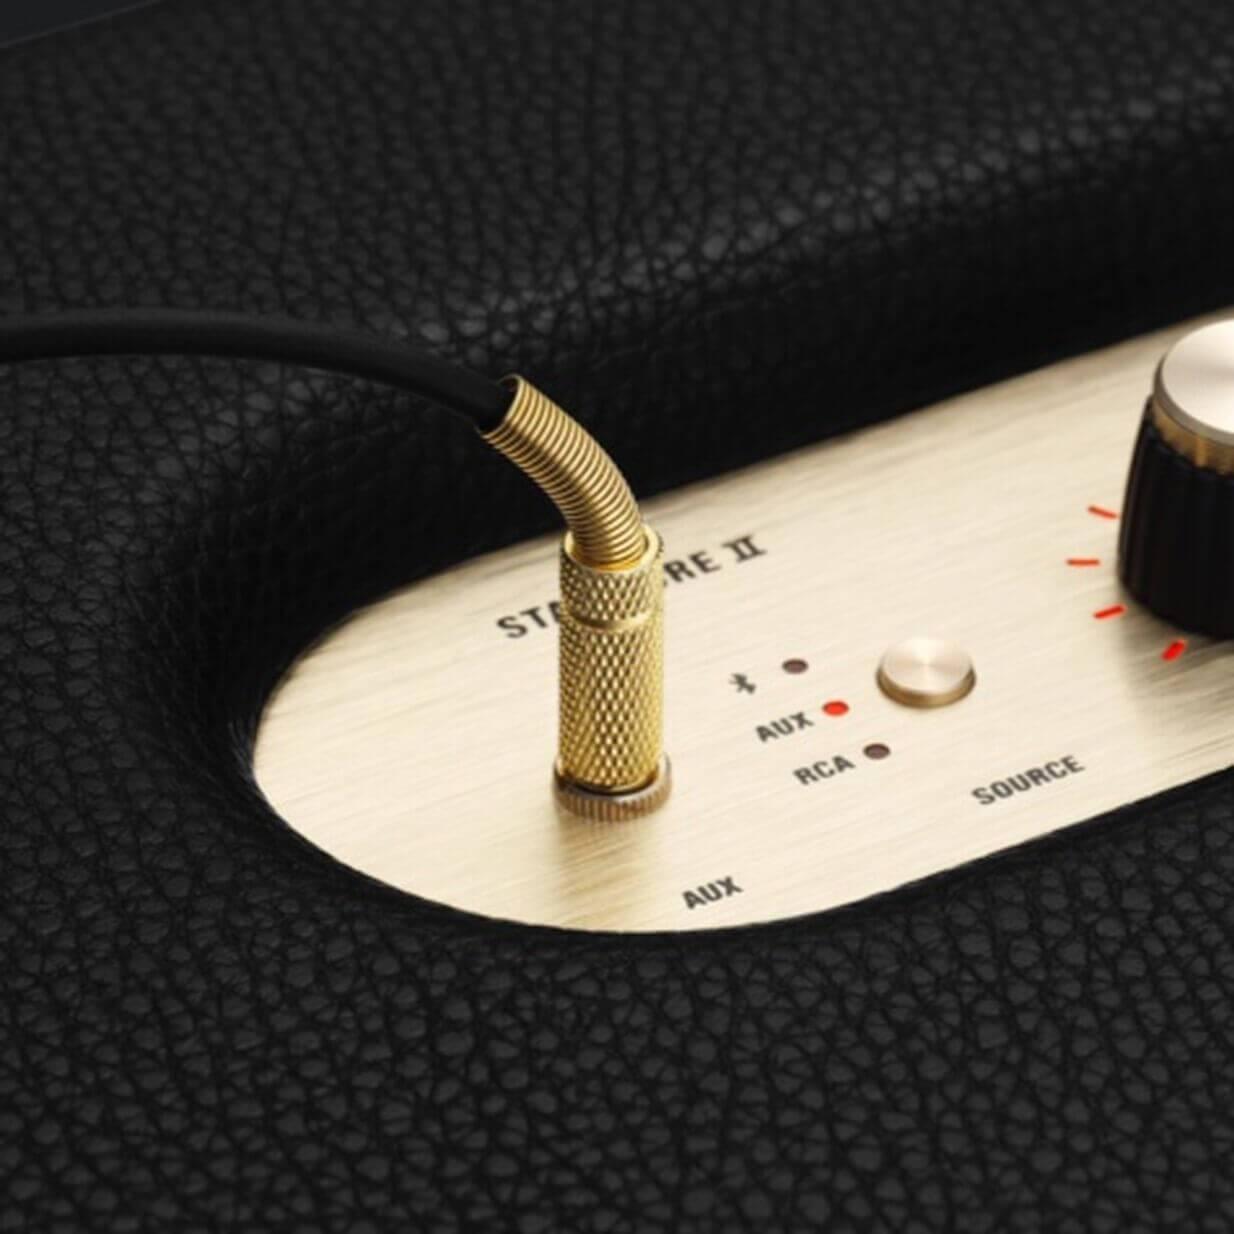 3.5mm jack & RCA input